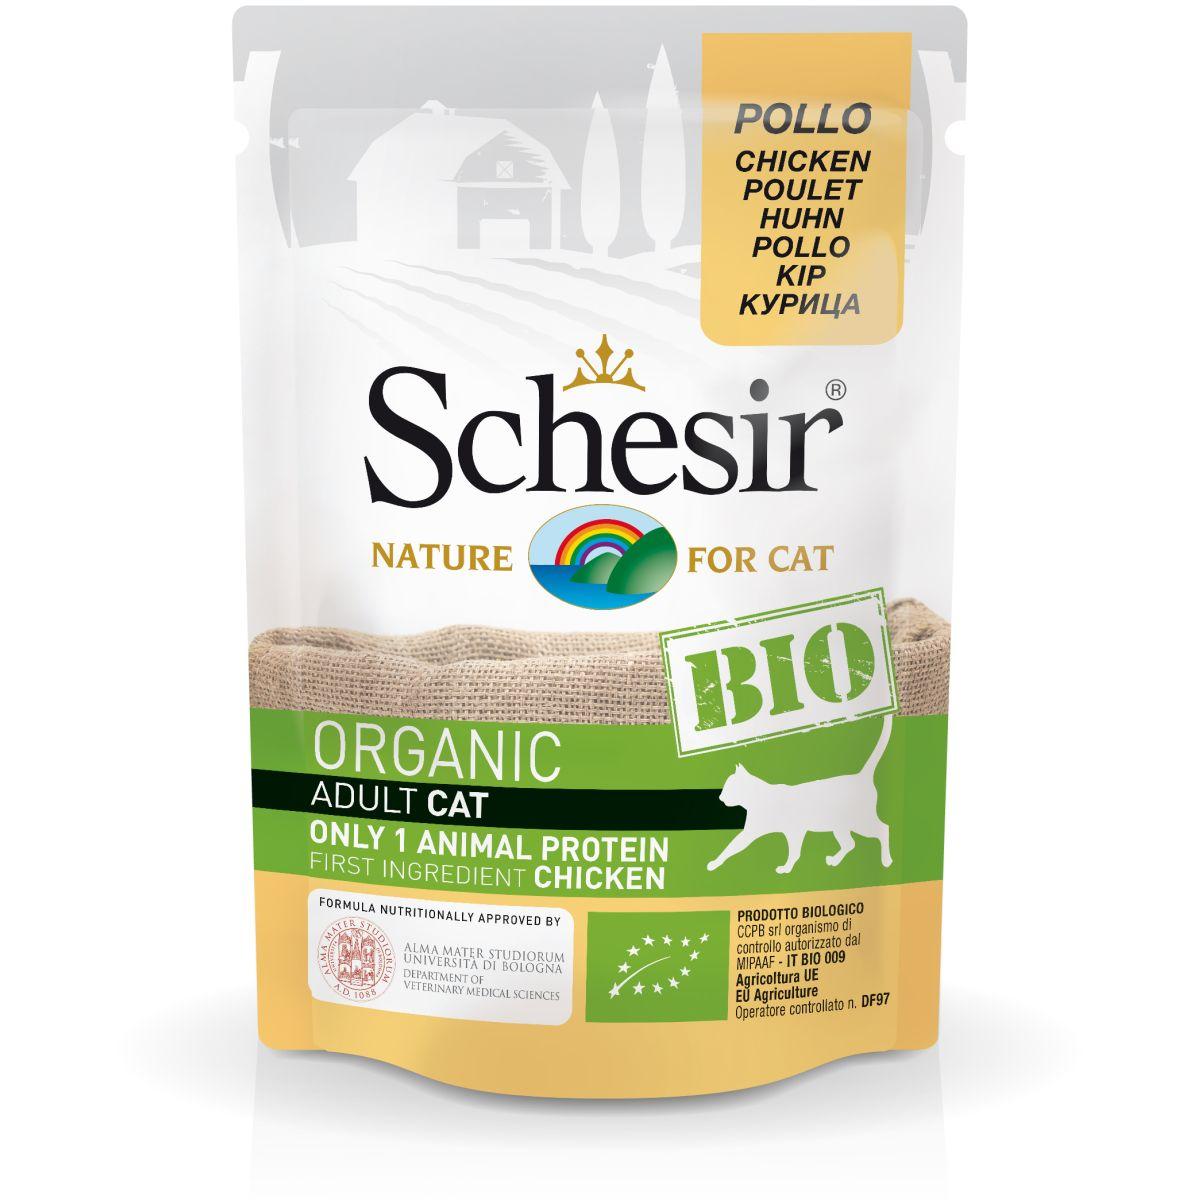 Schesir BIO Organic Kip